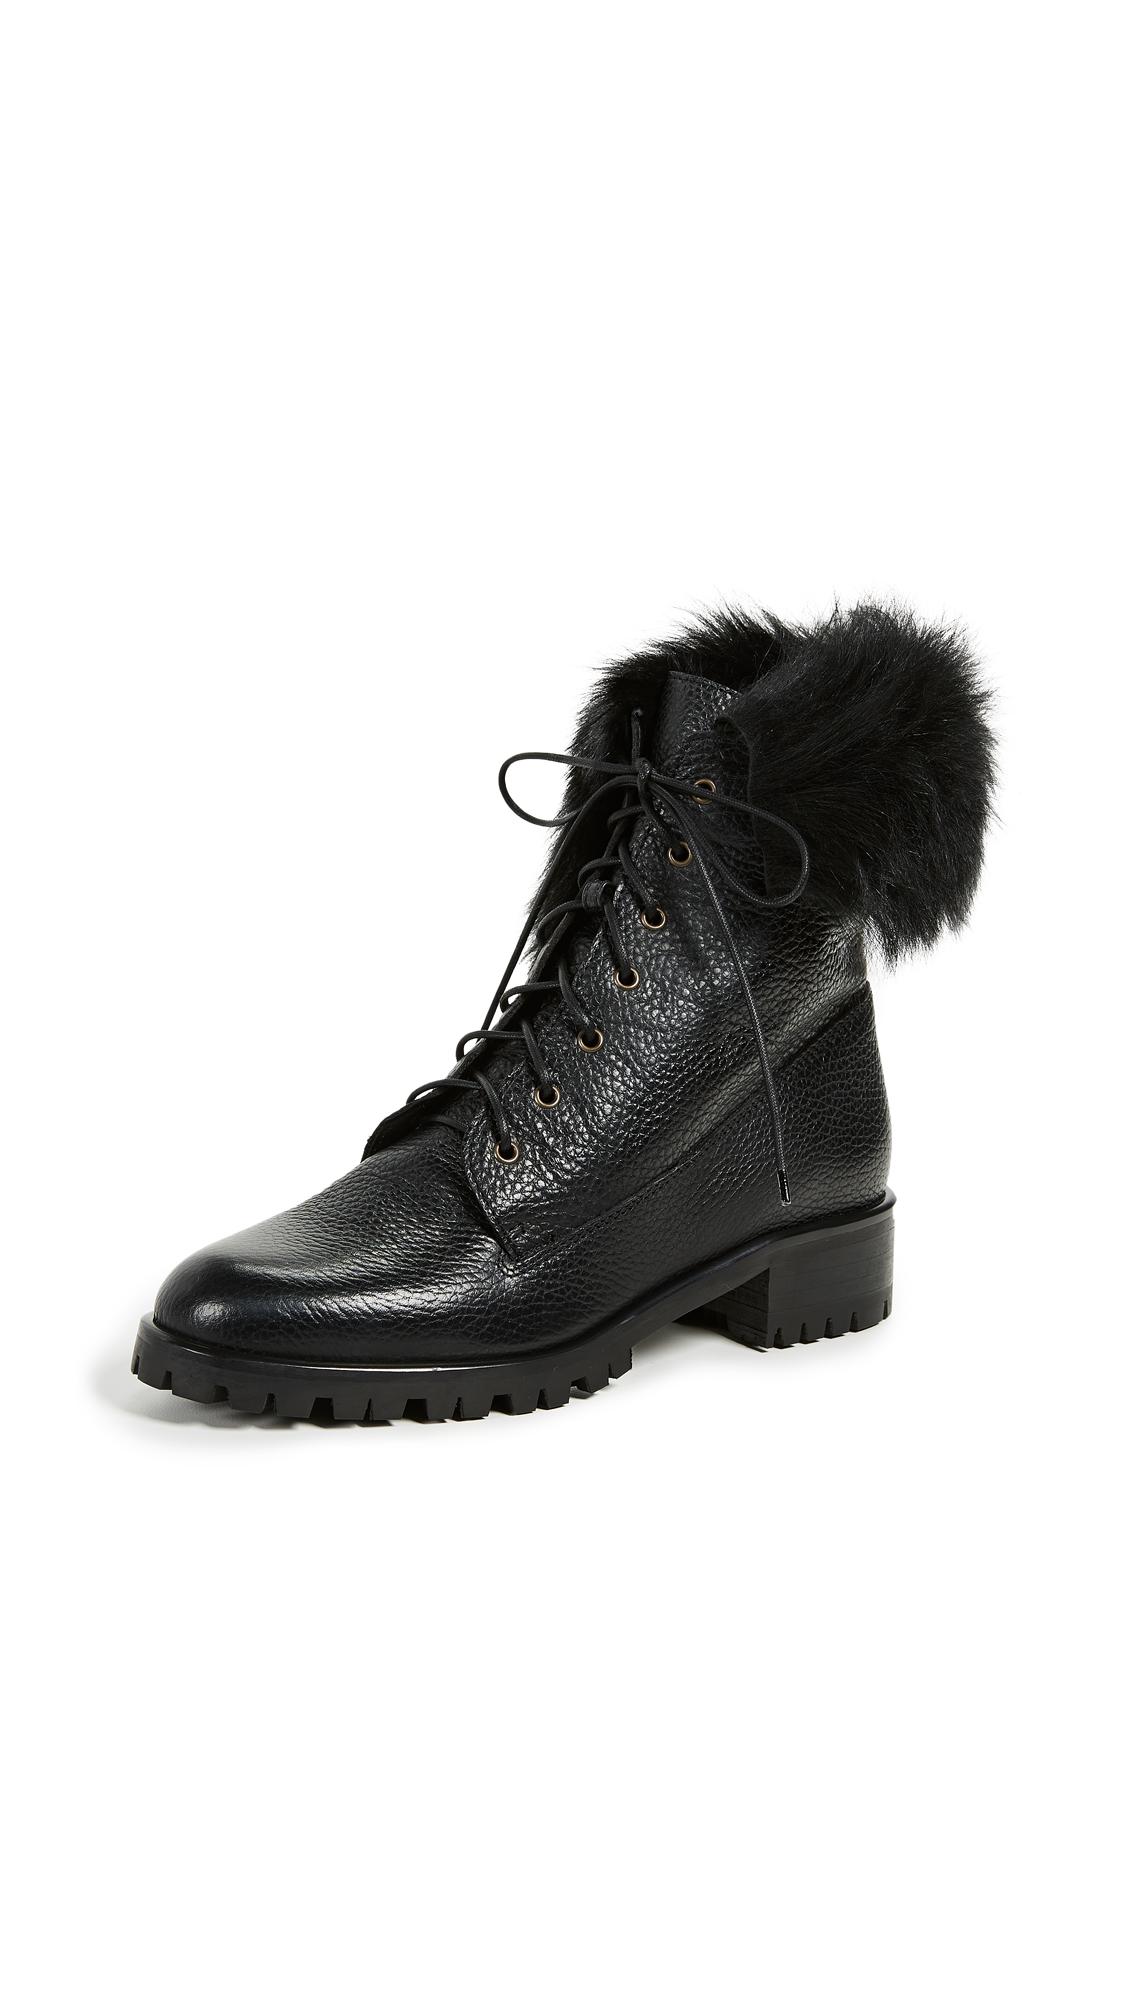 L.K. Bennett Delli Combat Boots - Black